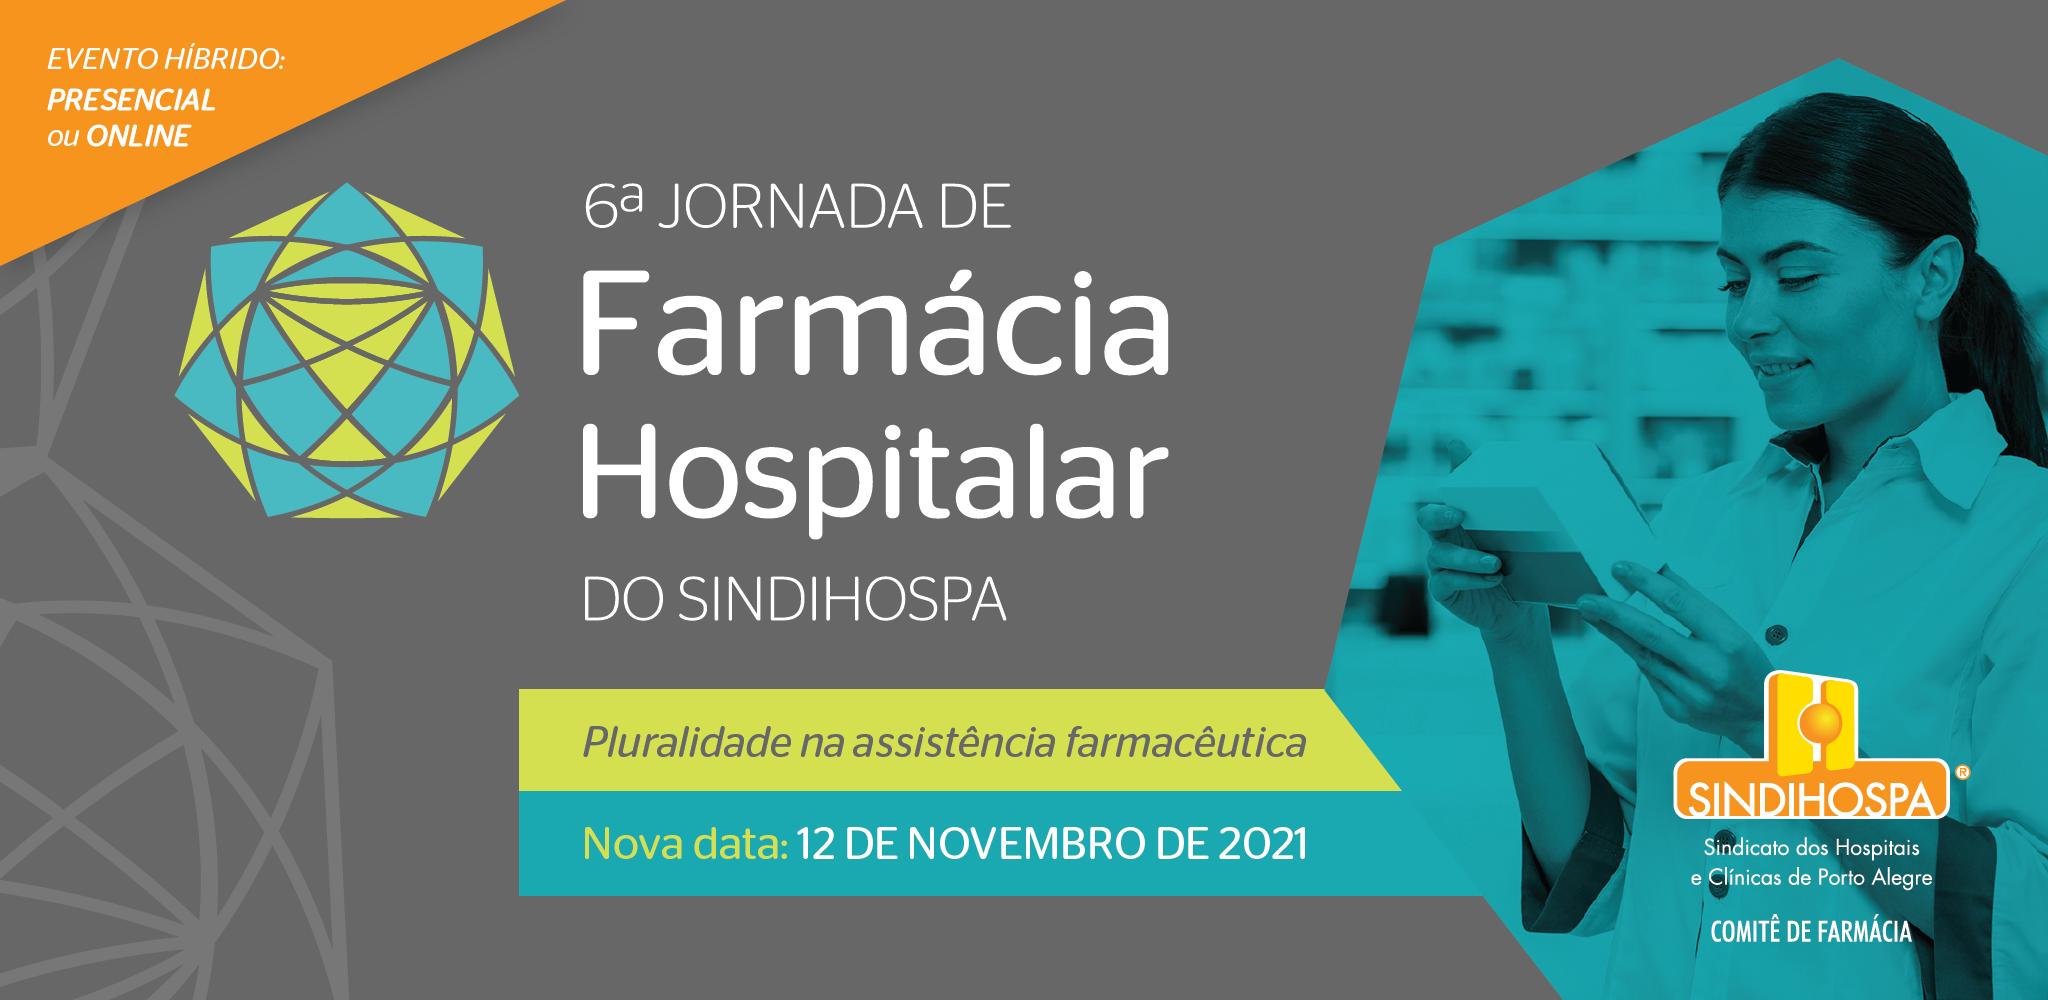 6ª Jornada de Farmácia Hospitalar do SINDIHOSPA